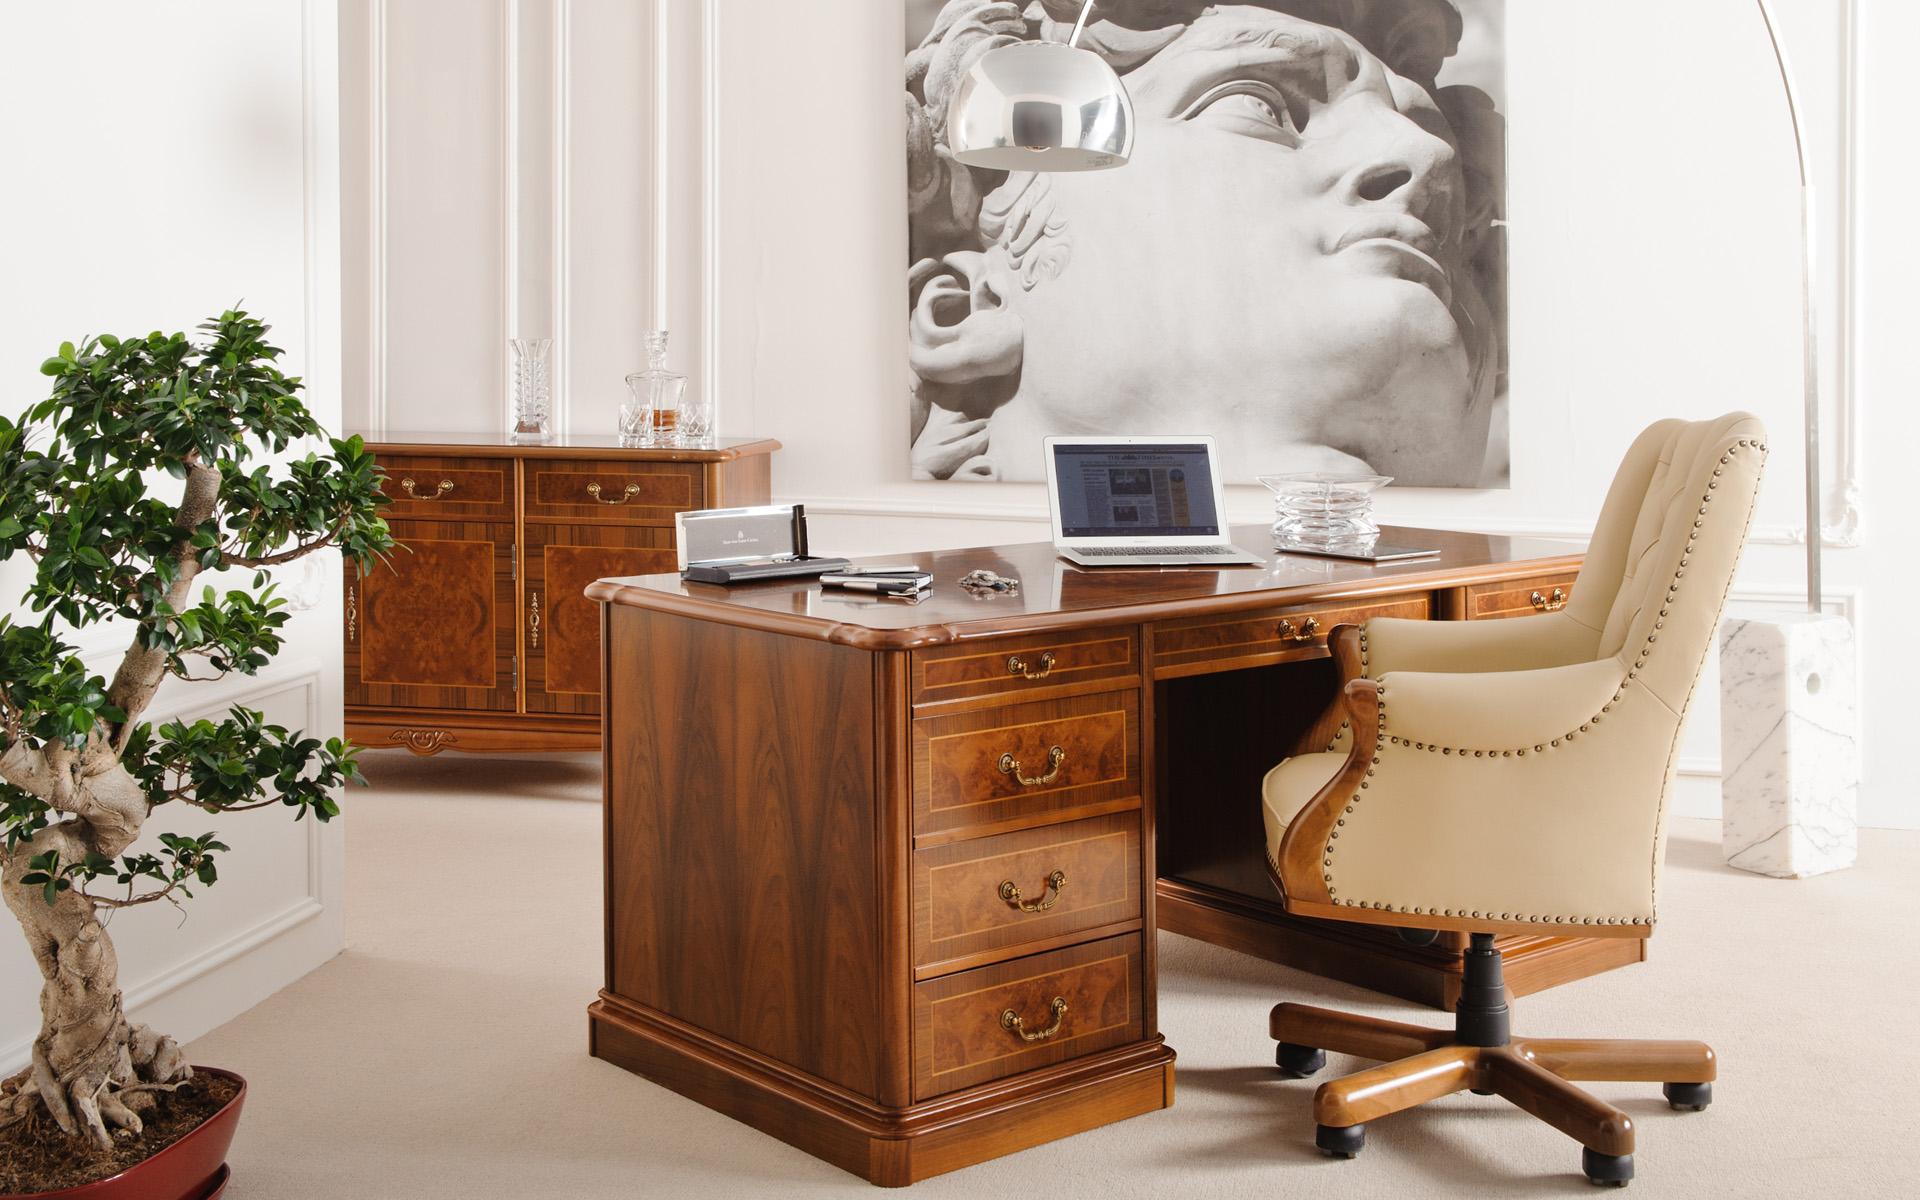 pisarna_office_Barocco_klasicno-pohistvo_classic-furniture_Klassischen-Moebel_2